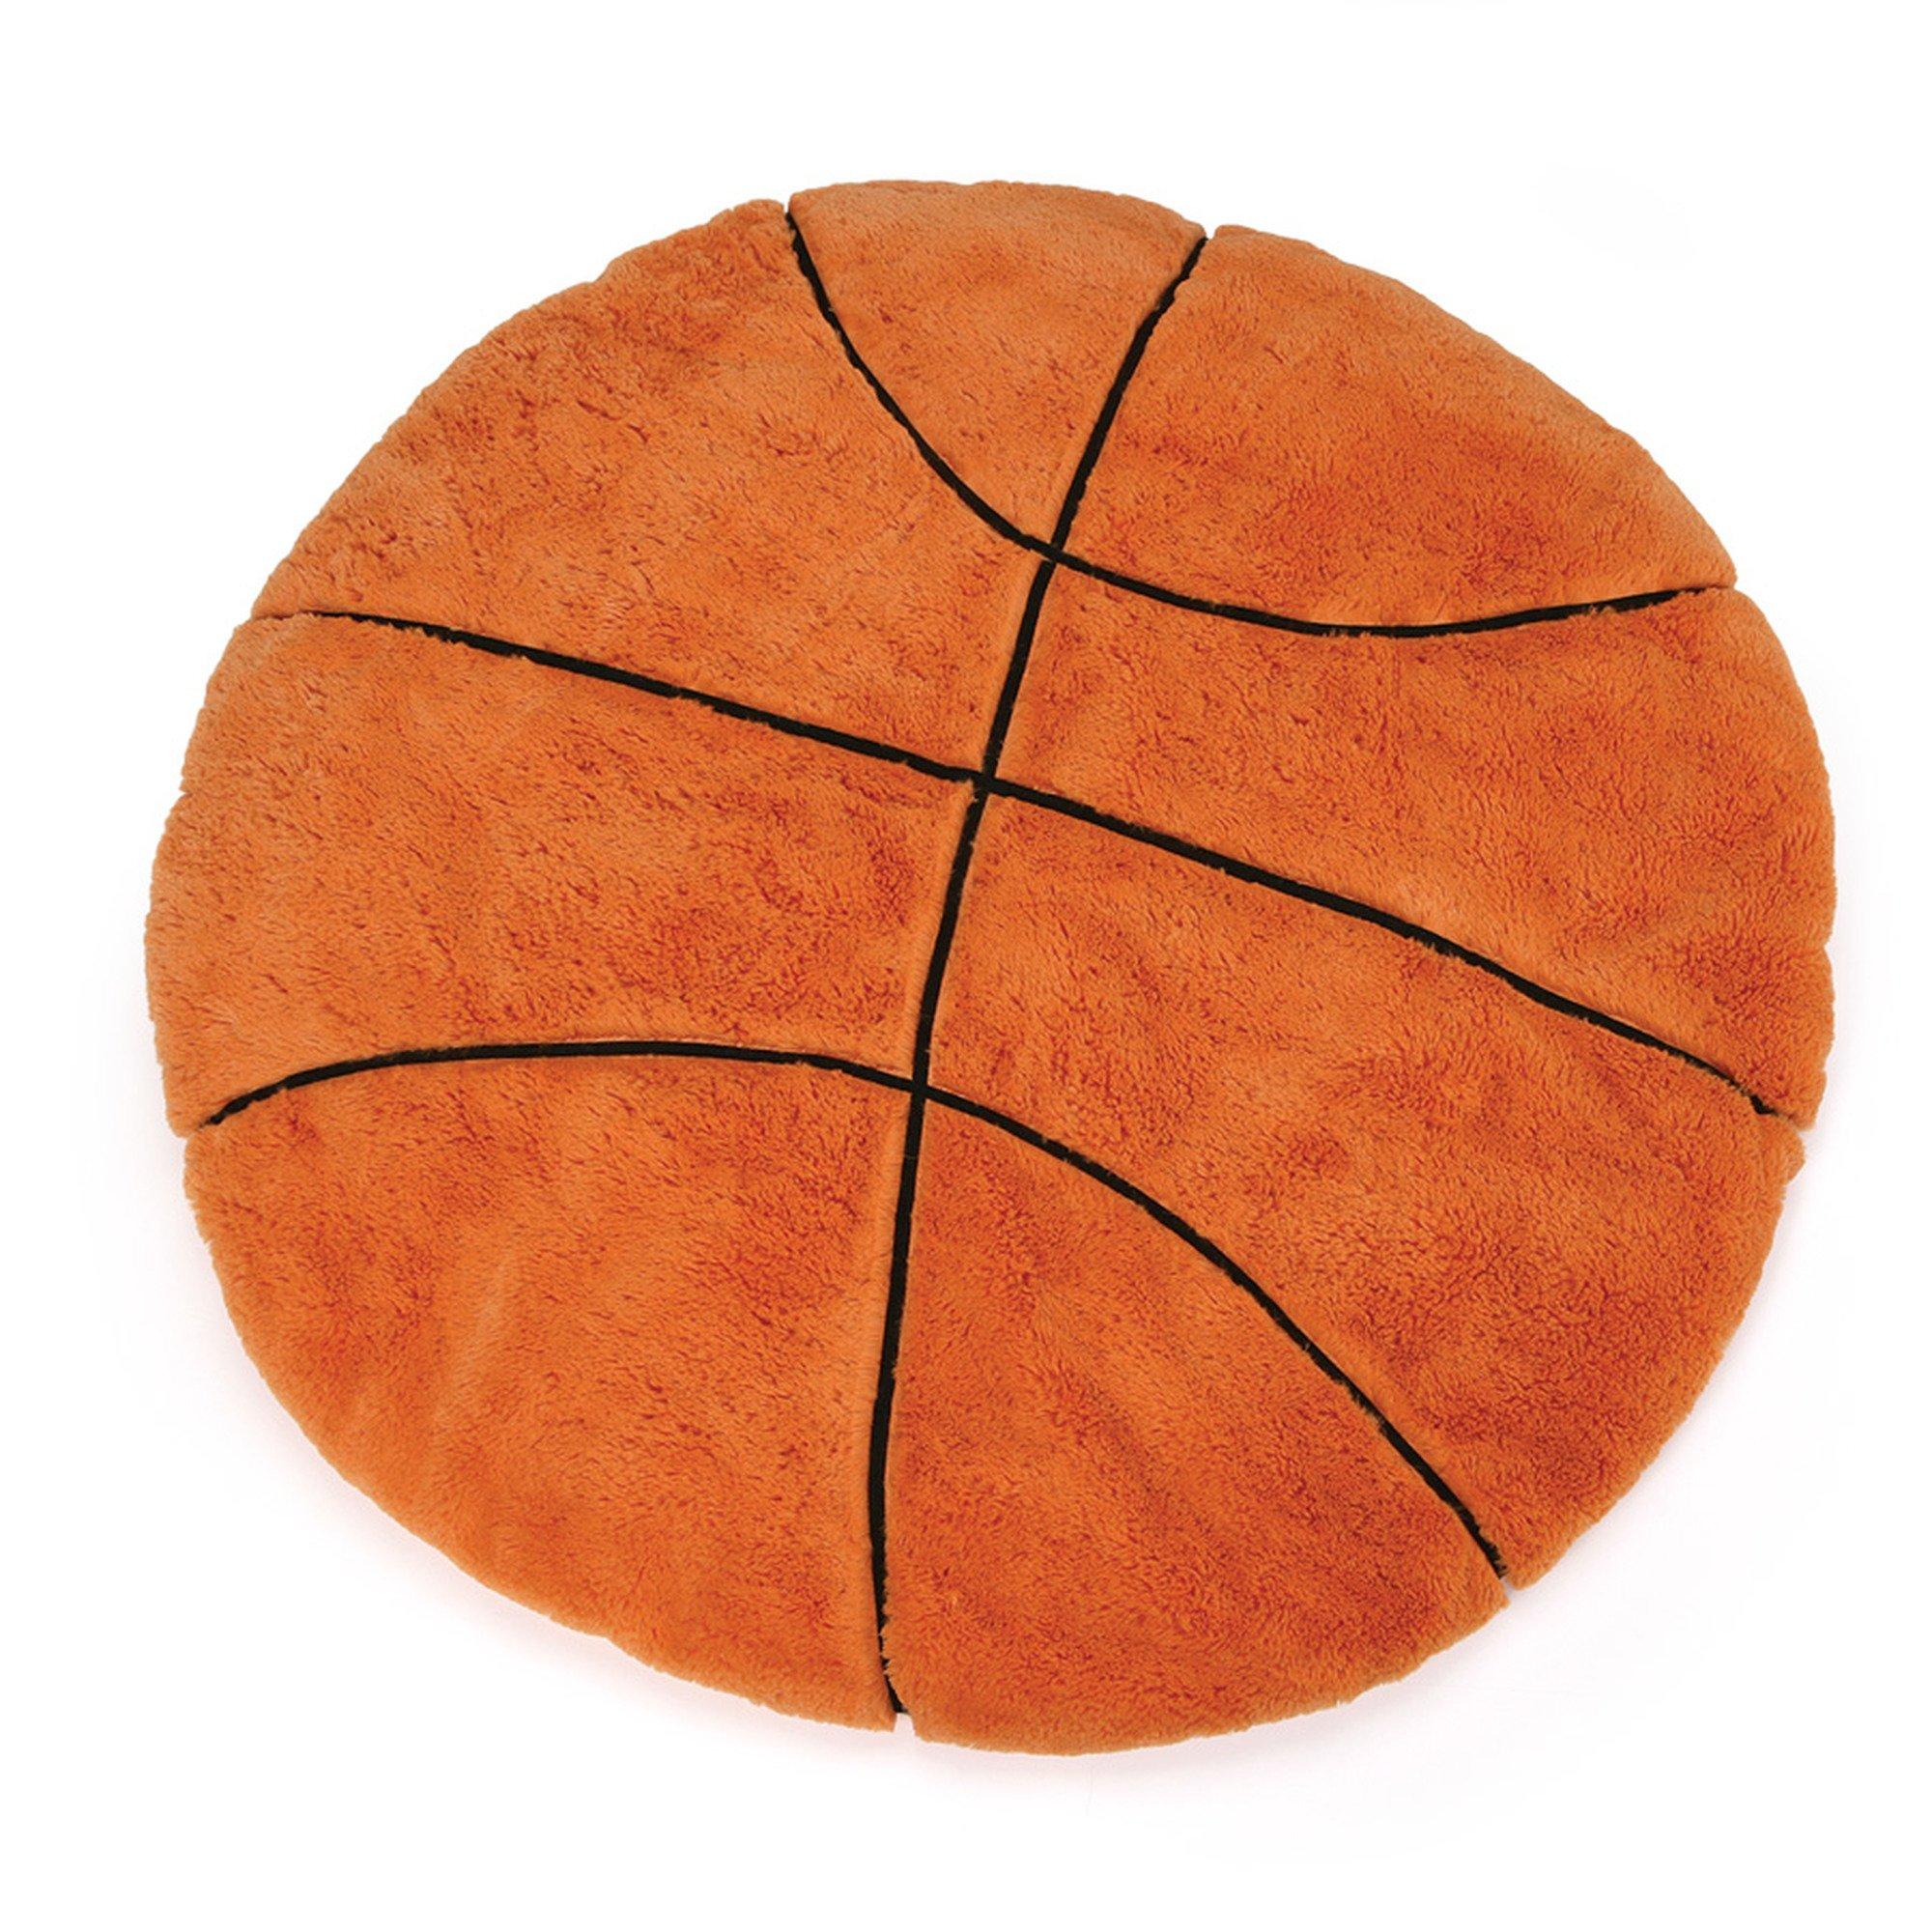 Gund Baby Play Blanket, Basketball Cozy